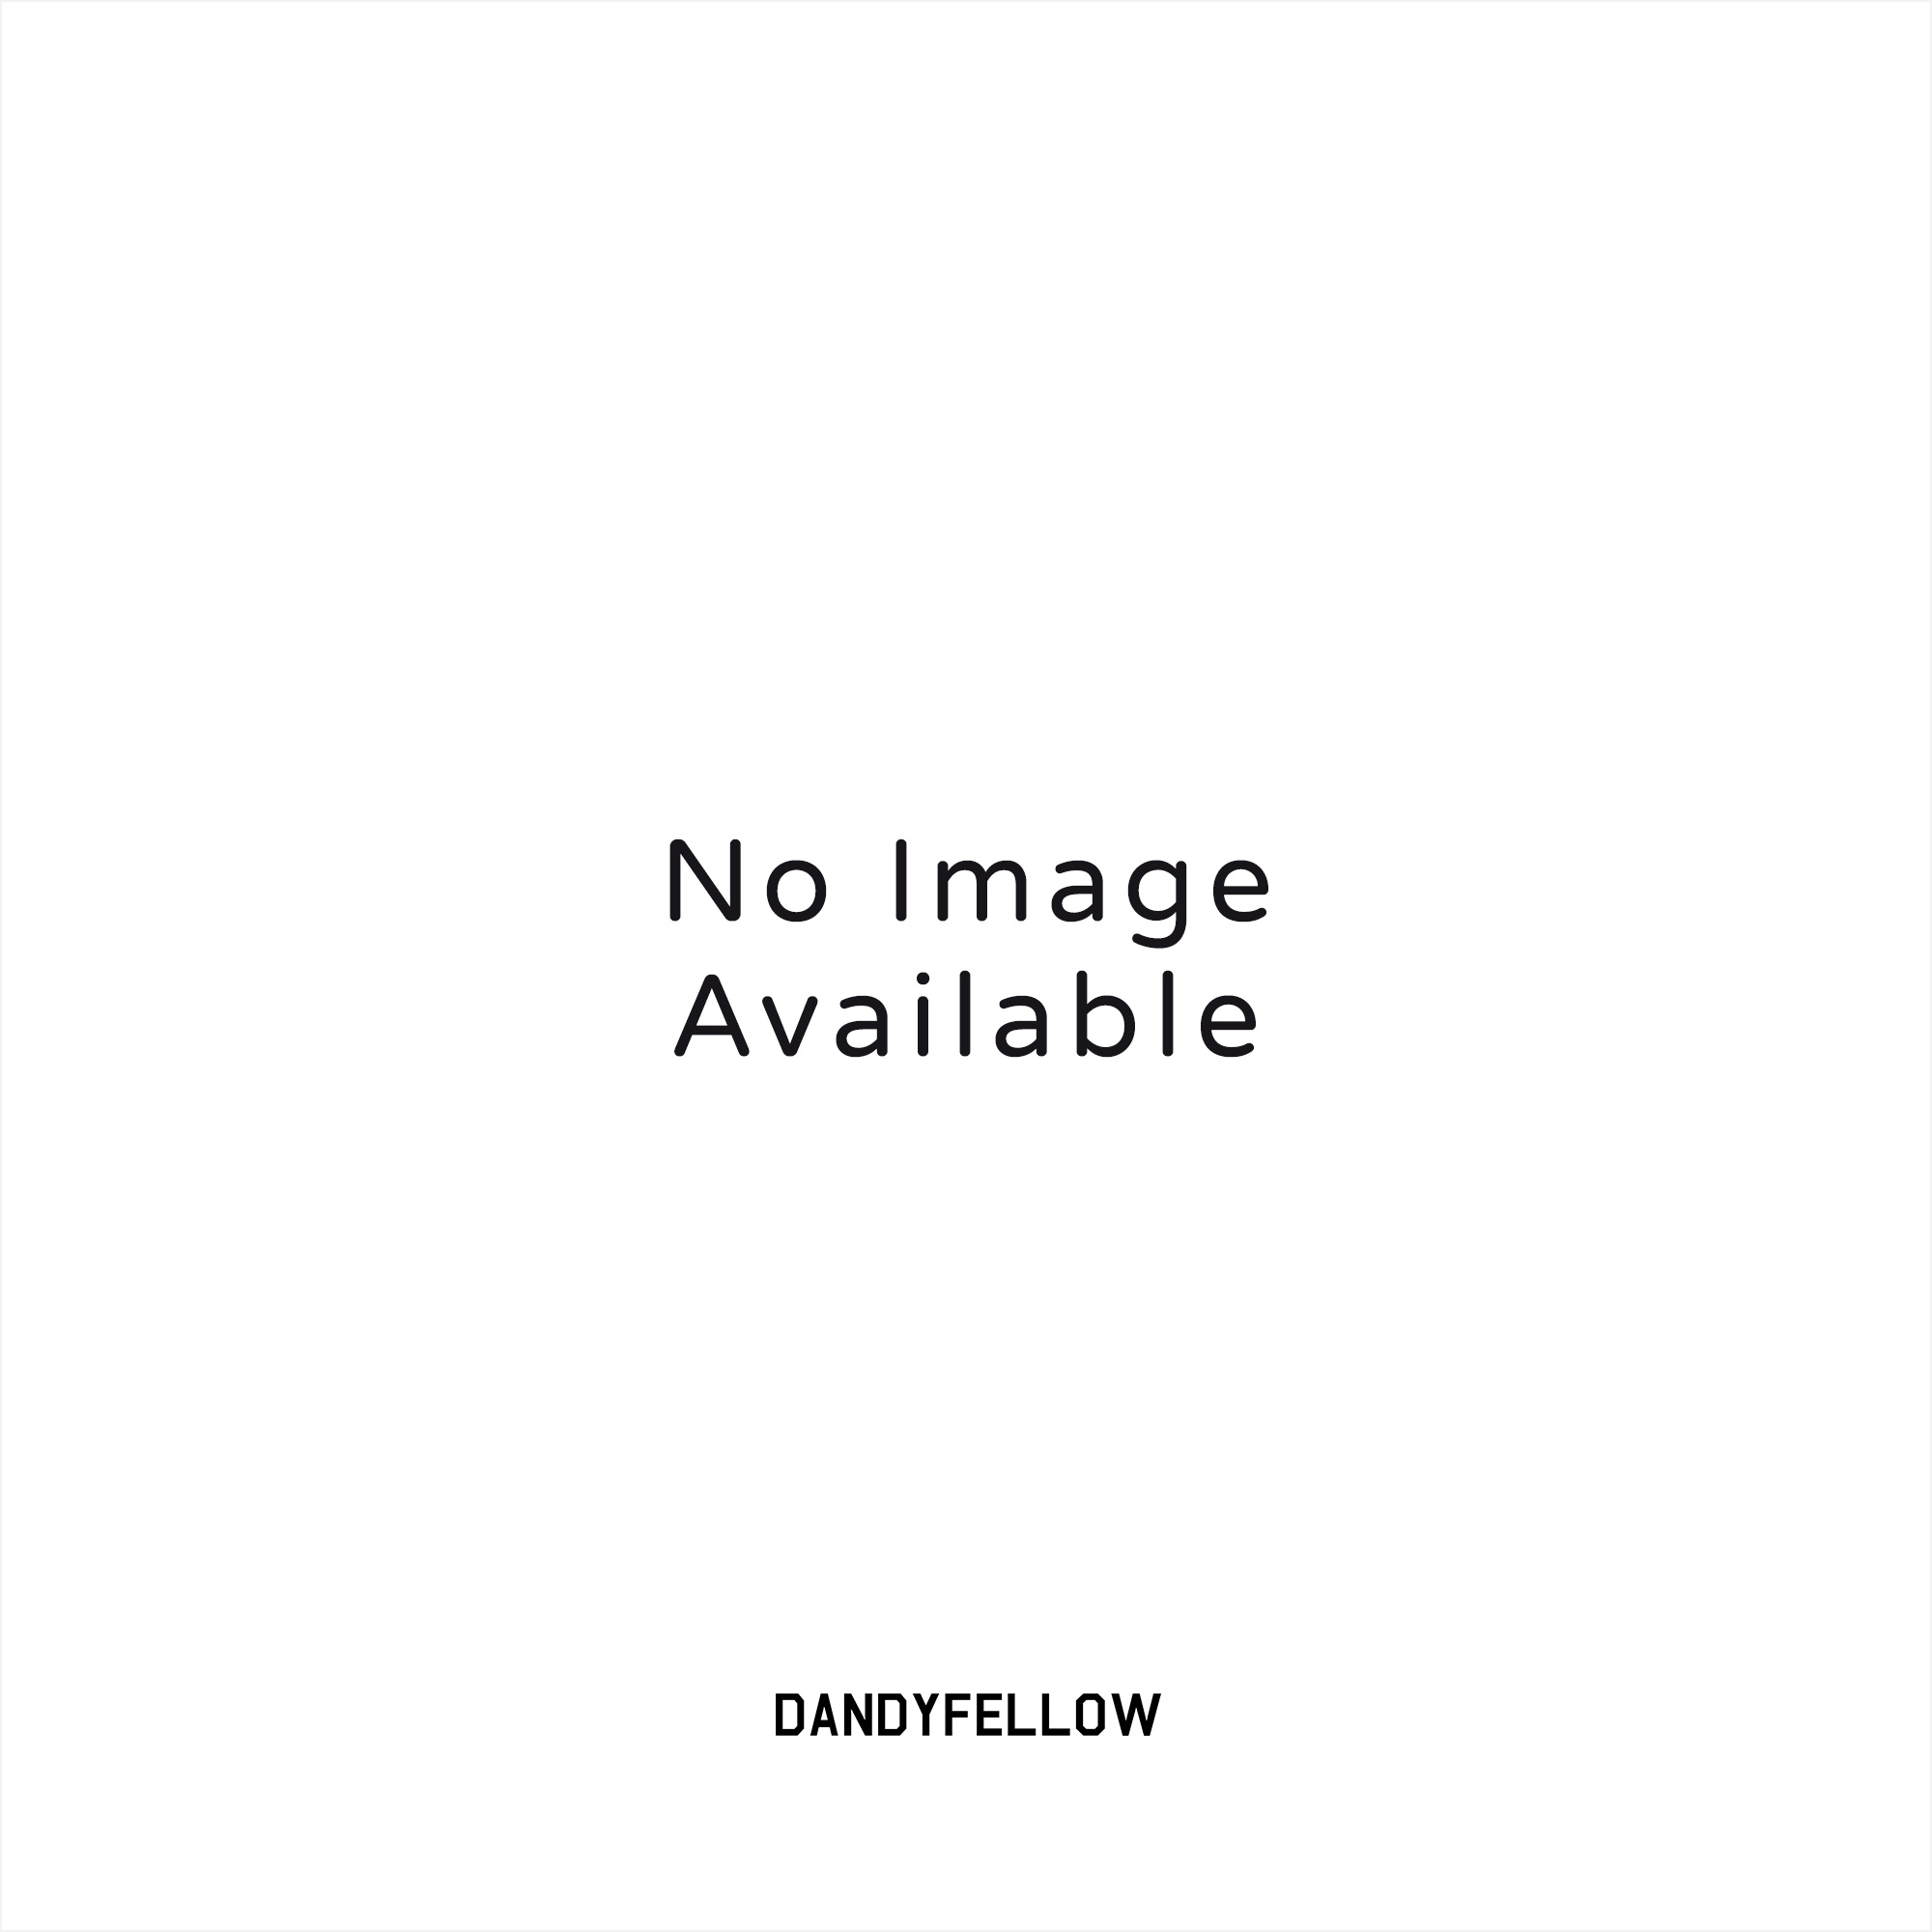 Ray Ban Ray-Ban Aviator Flat Gold Sunglasses RB3513 149/13